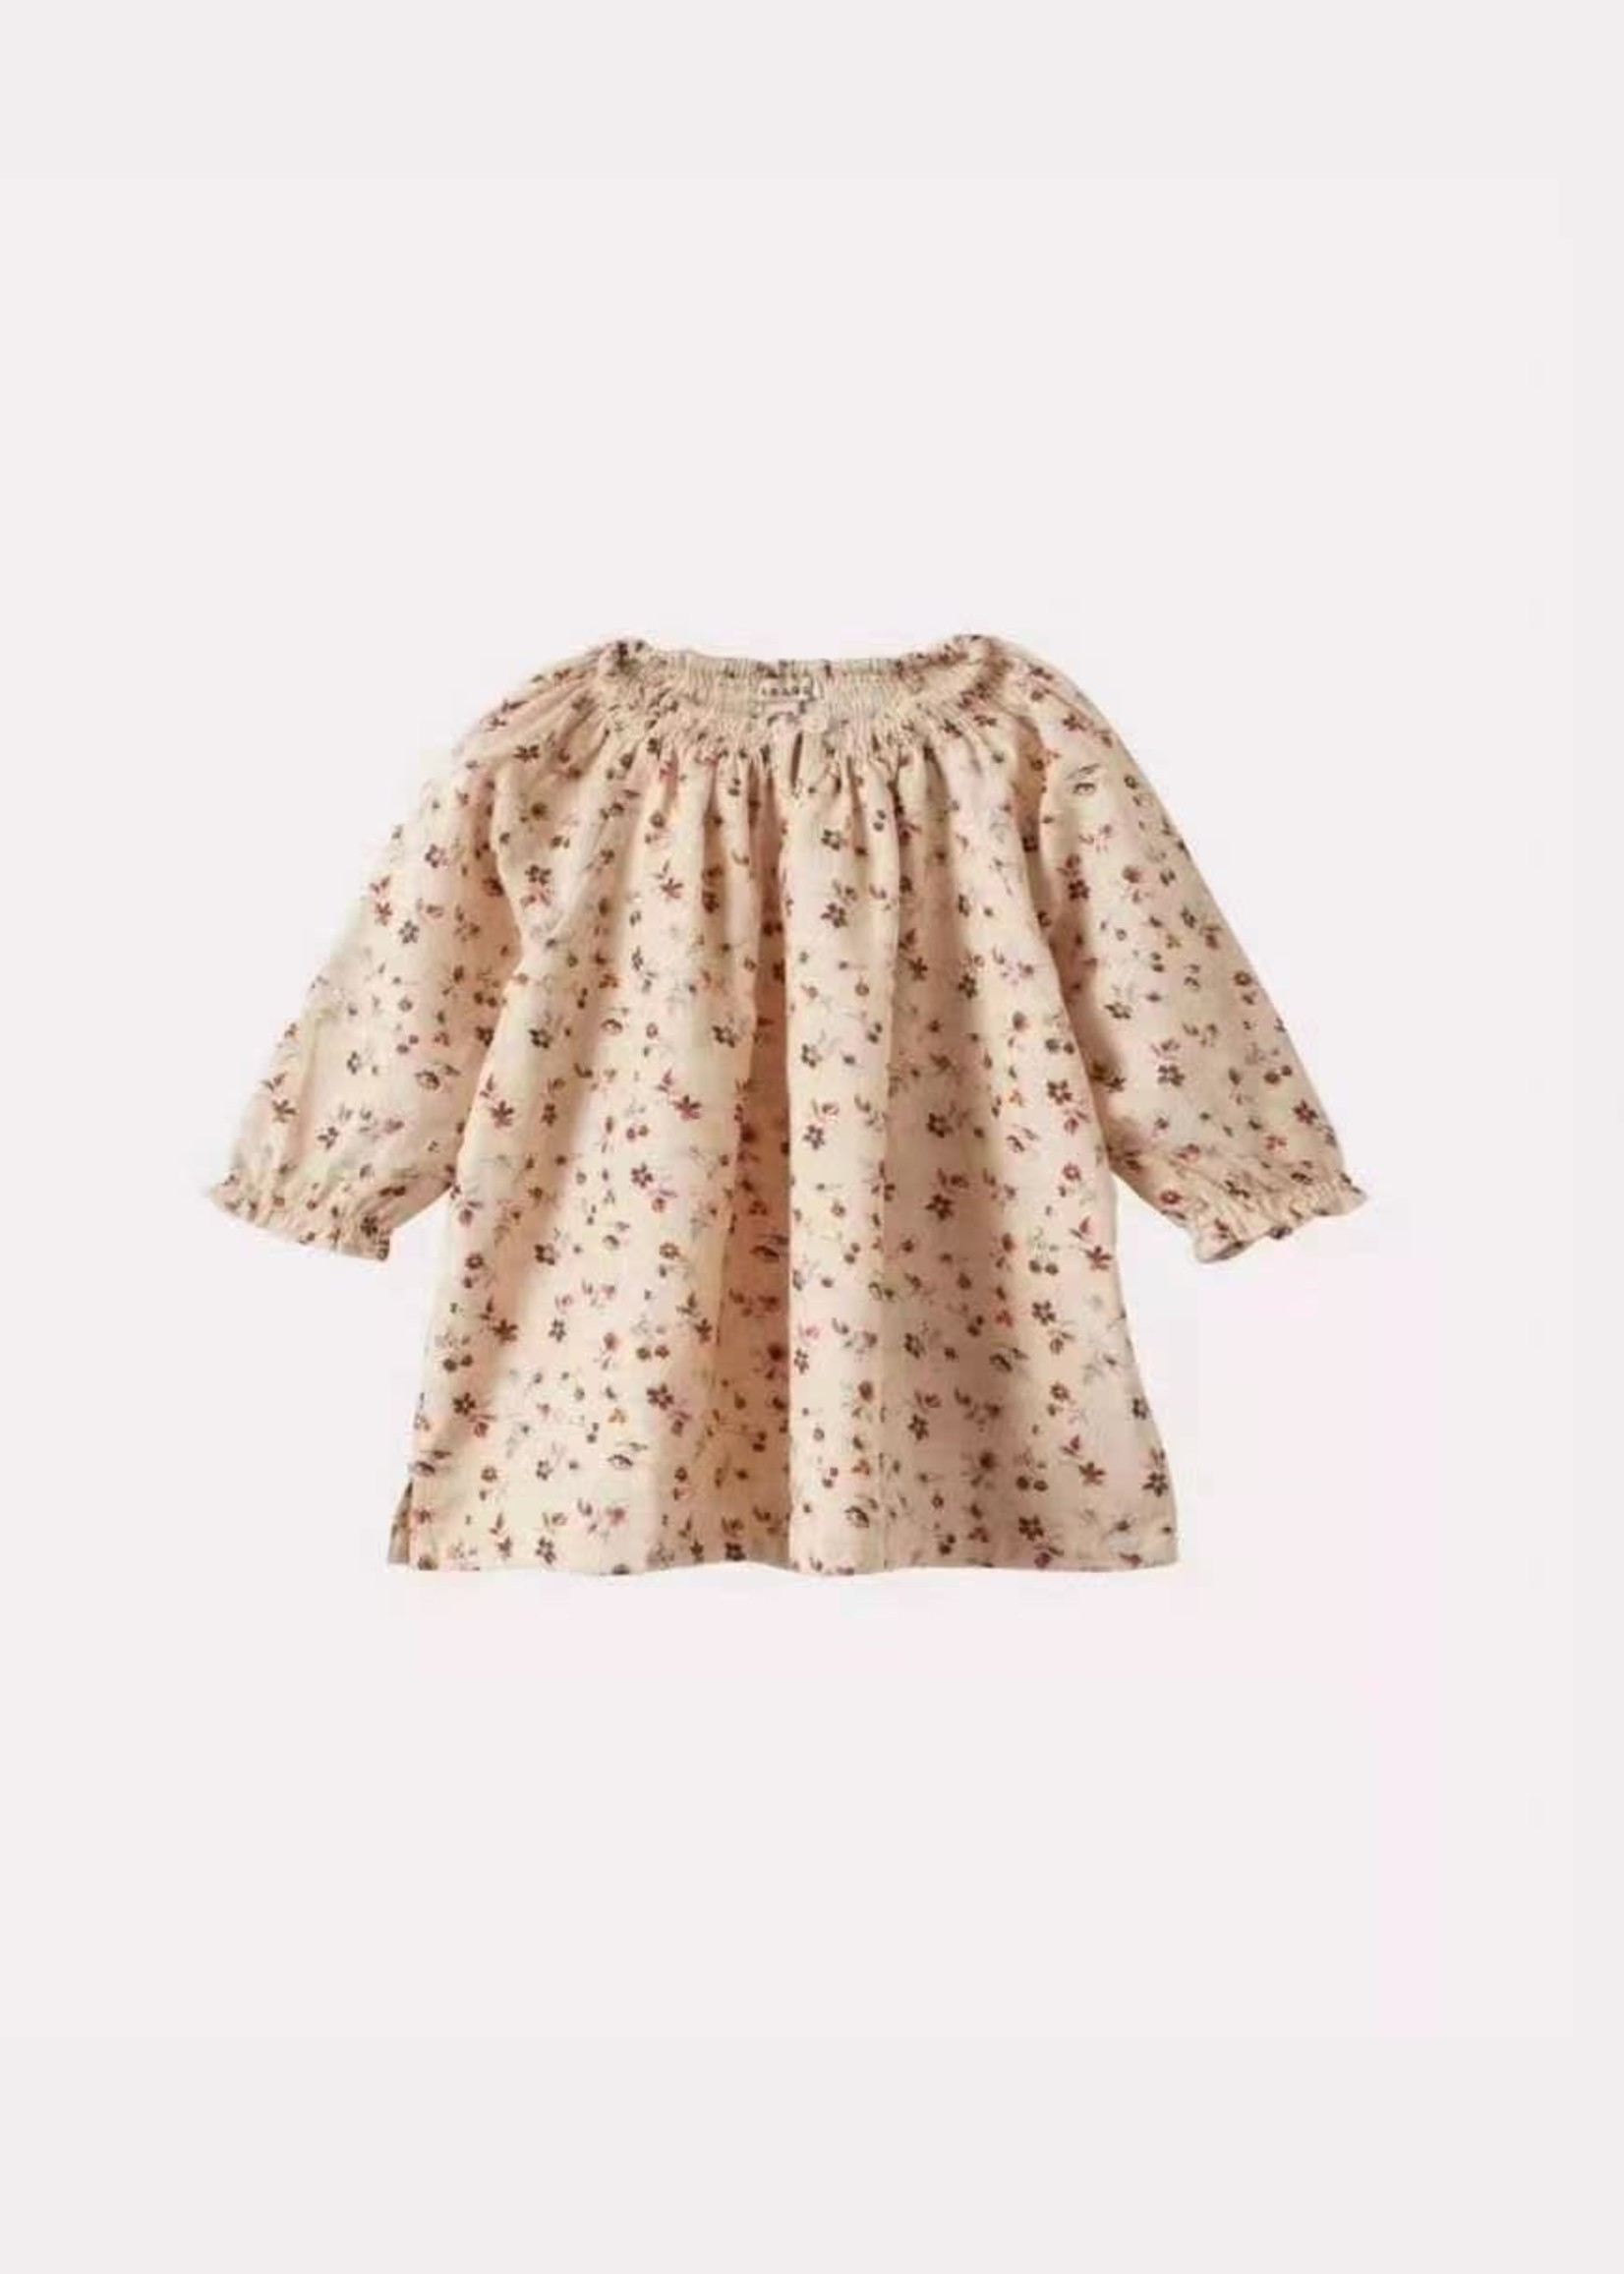 Caramel Caramel-ss21 AROWANA baby DRESS S21DF